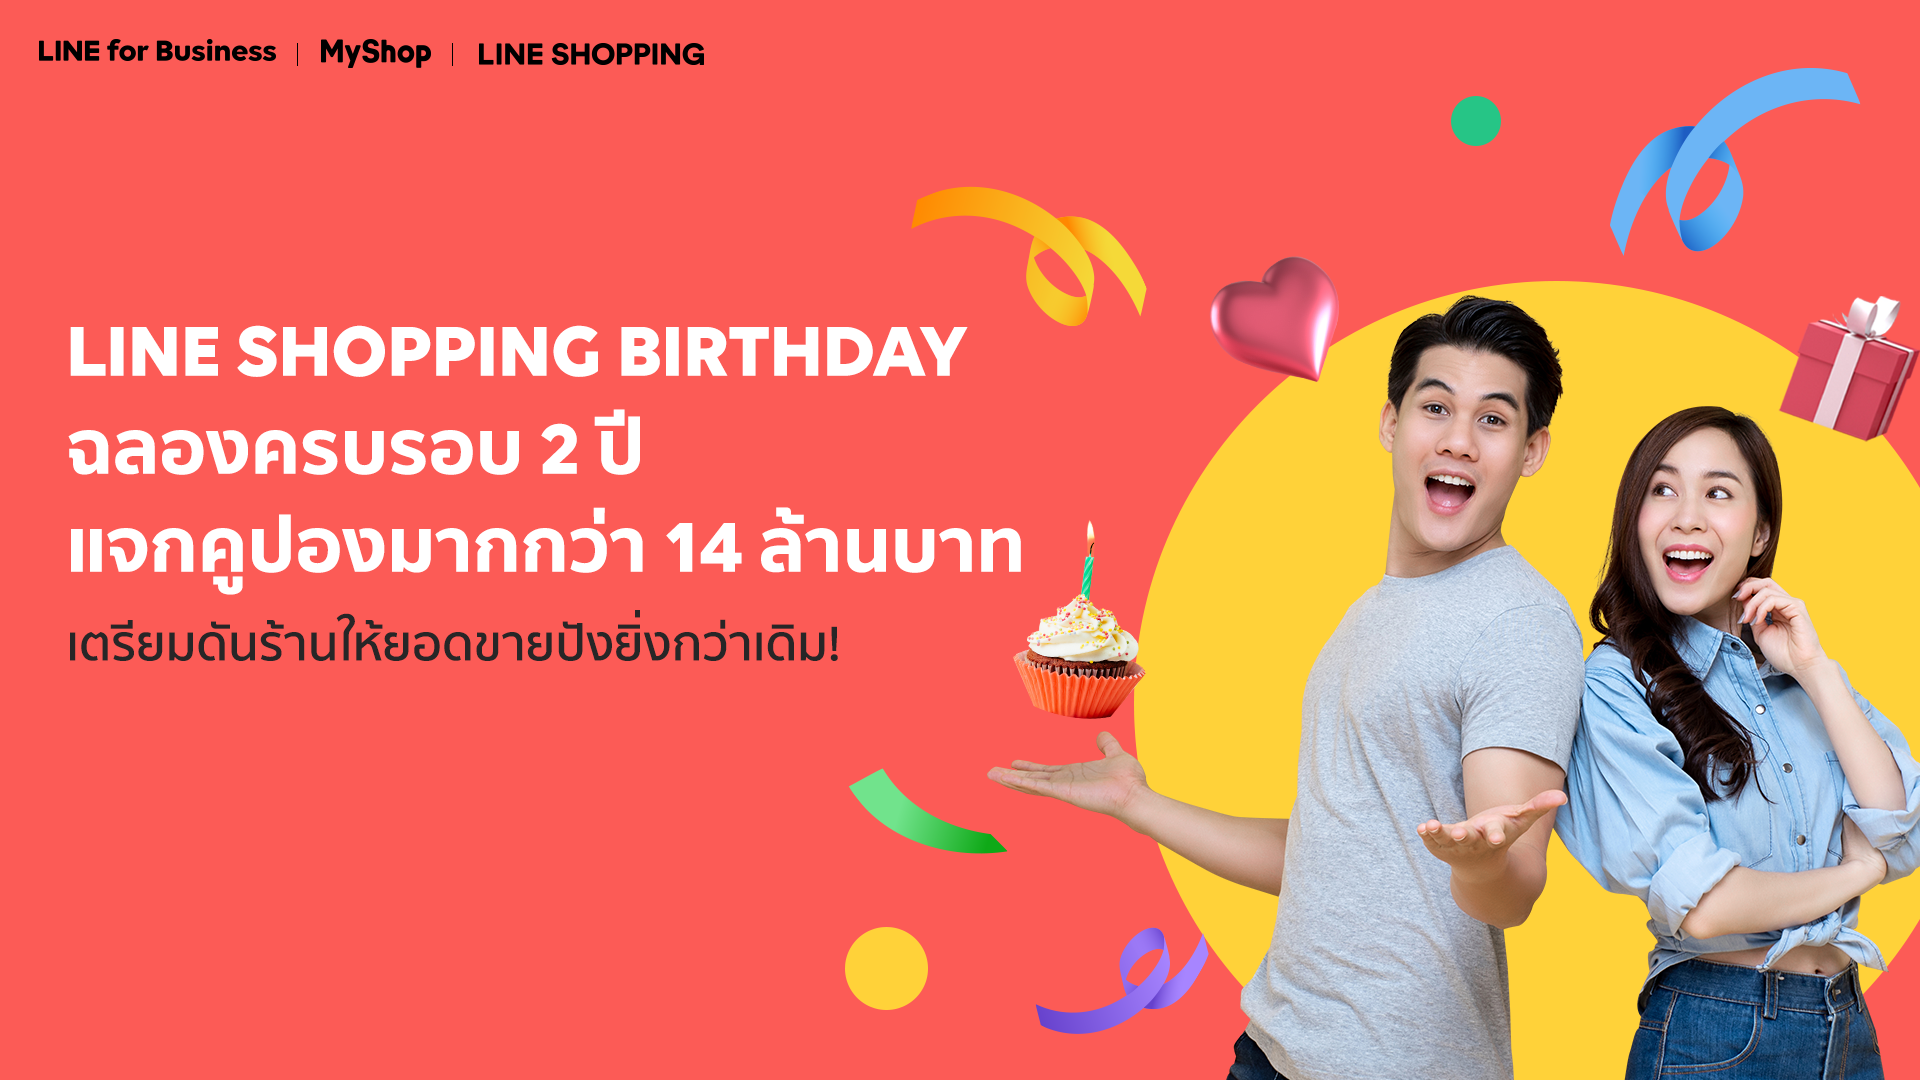 "LINE SHOPPING BIRTHDAY ""ฉลองครบรอบ 2 ปี แจกคูปองให้ร้านค้ากว่า 14 ล้านบาท"" เตรียมดันร้านให้ดัง เพิ่มยอดให้ปังอีกเท่าตัว!"